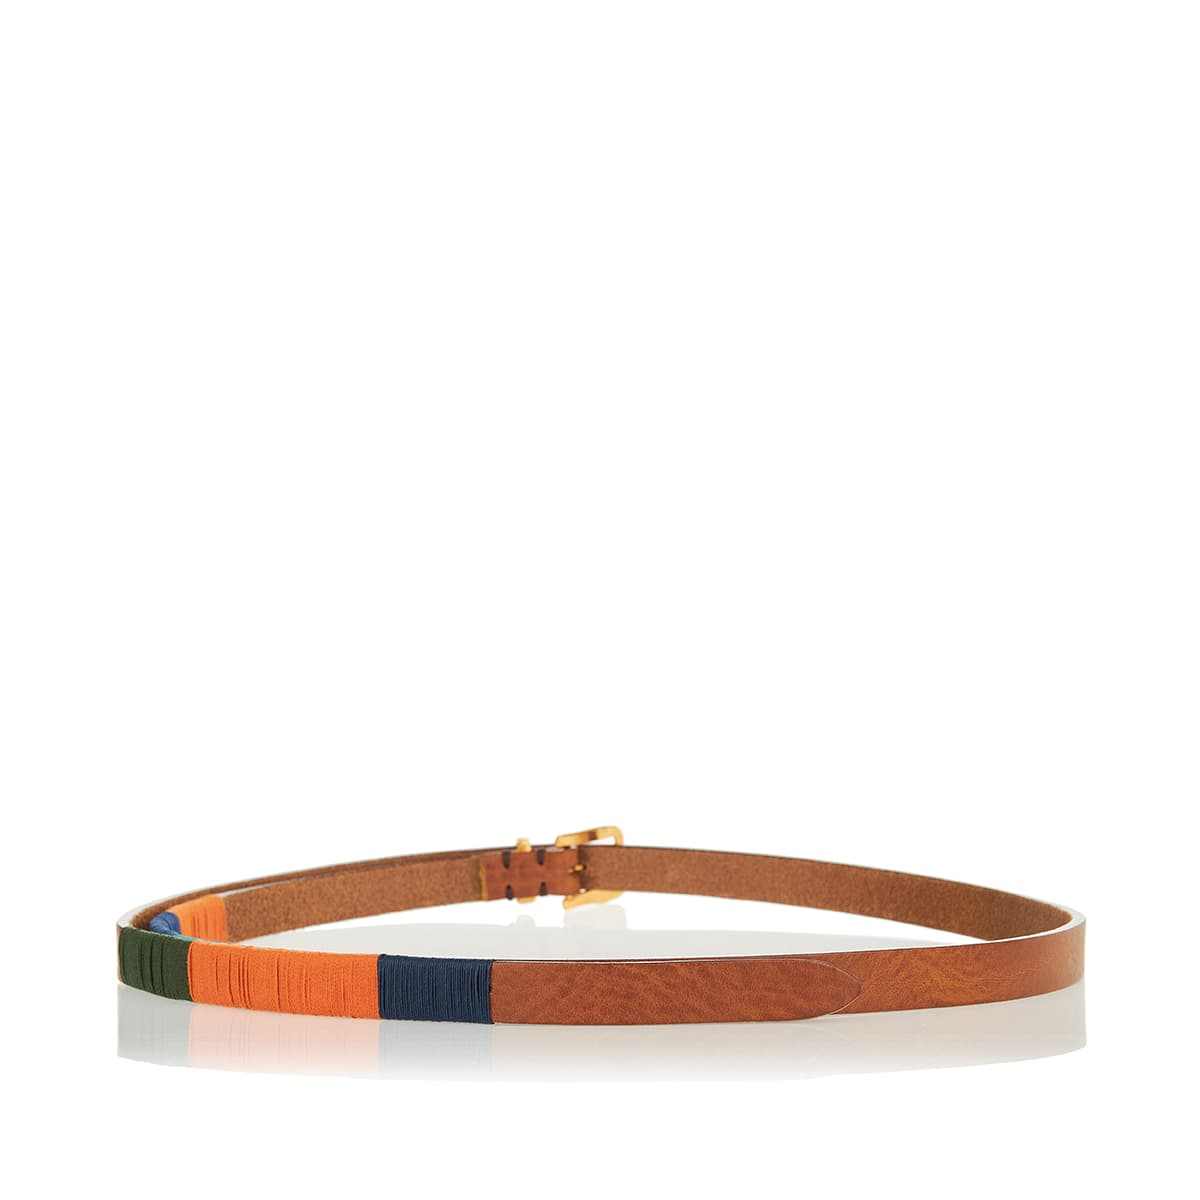 x Federico Curradi Tereso leather belt